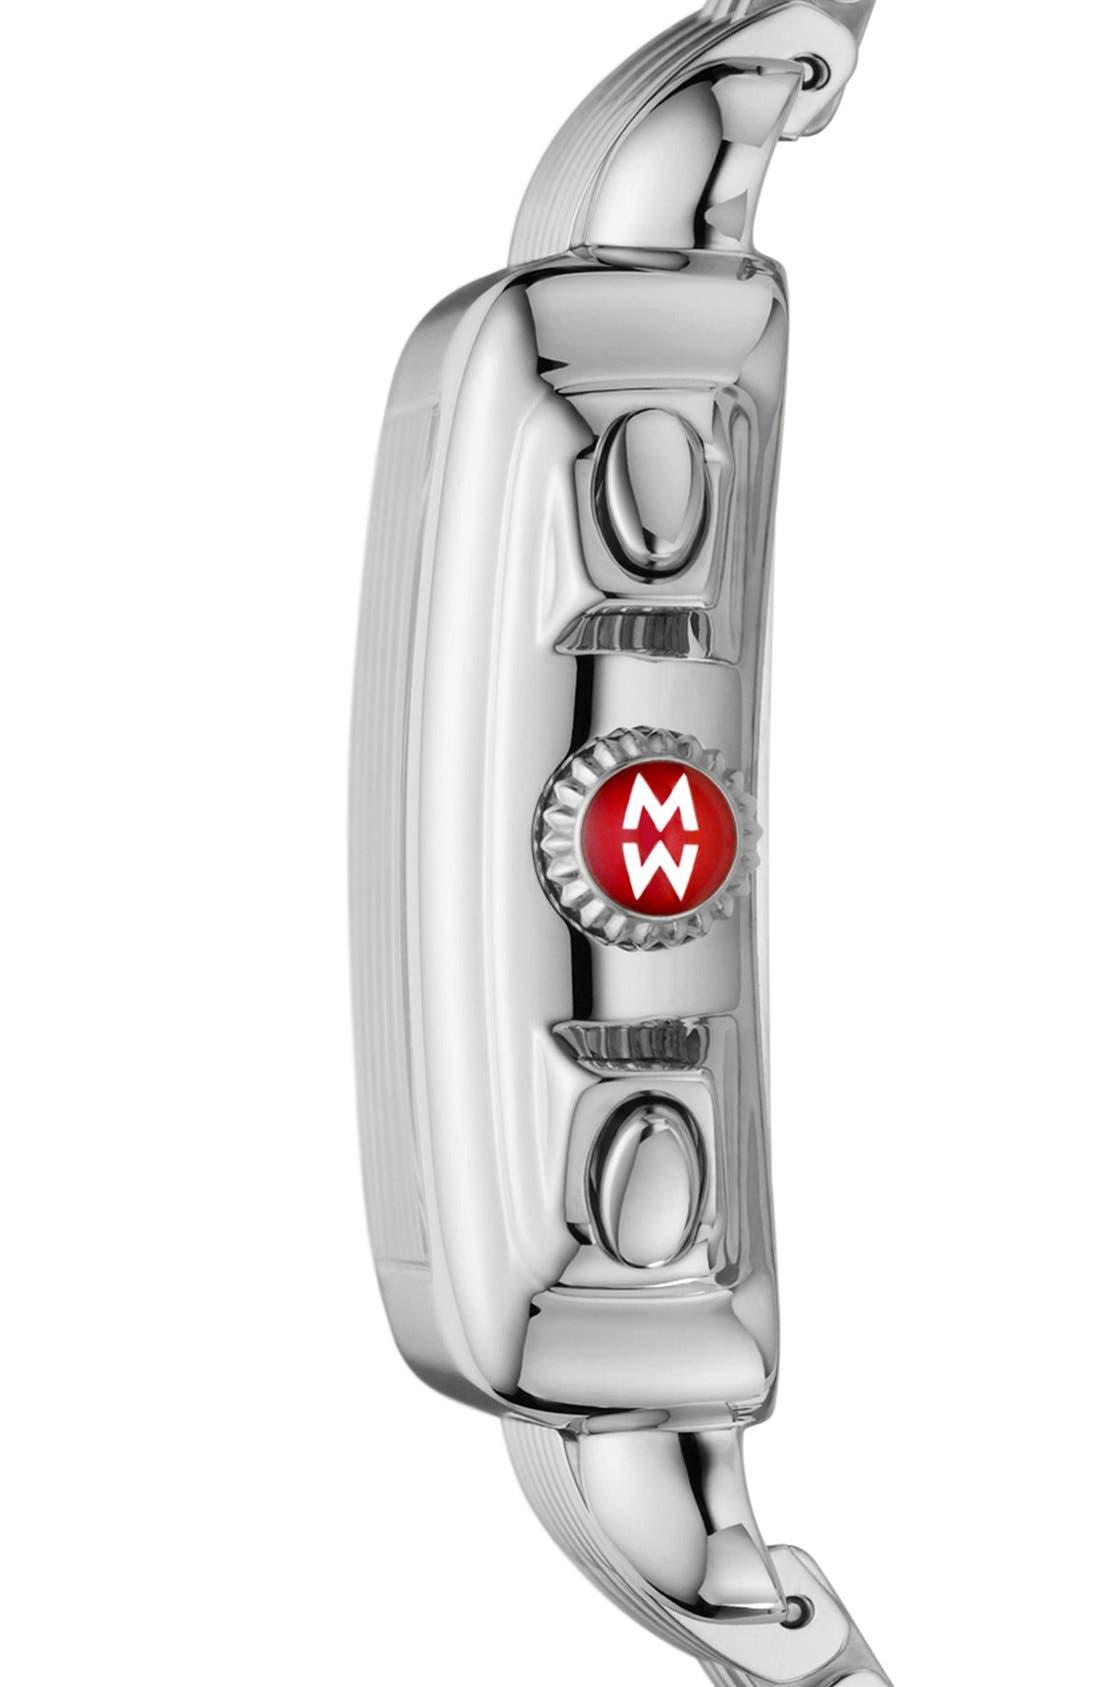 Deco 18mm Bracelet Watchband,                             Alternate thumbnail 7, color,                             SILVER